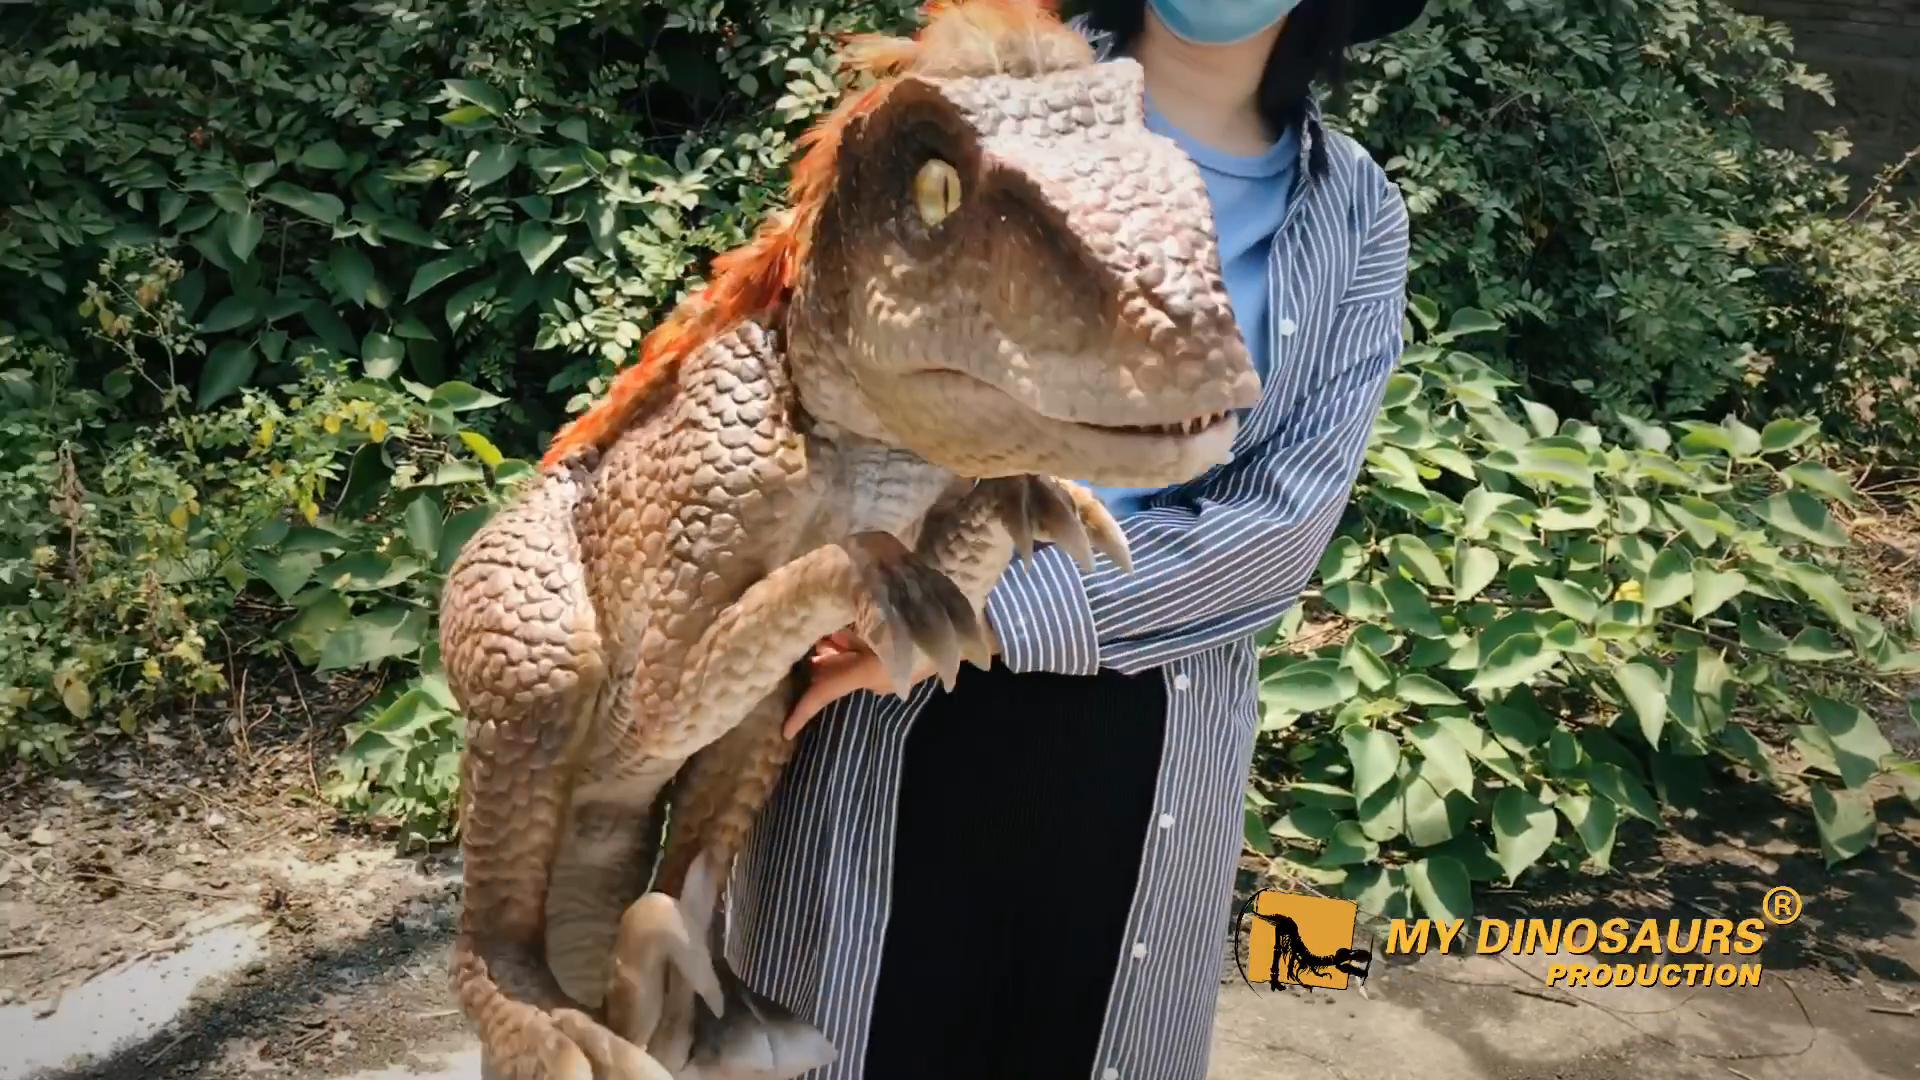 Benim Dino HP016 dinozor Prop gerçekçi dinozor bebek kukla